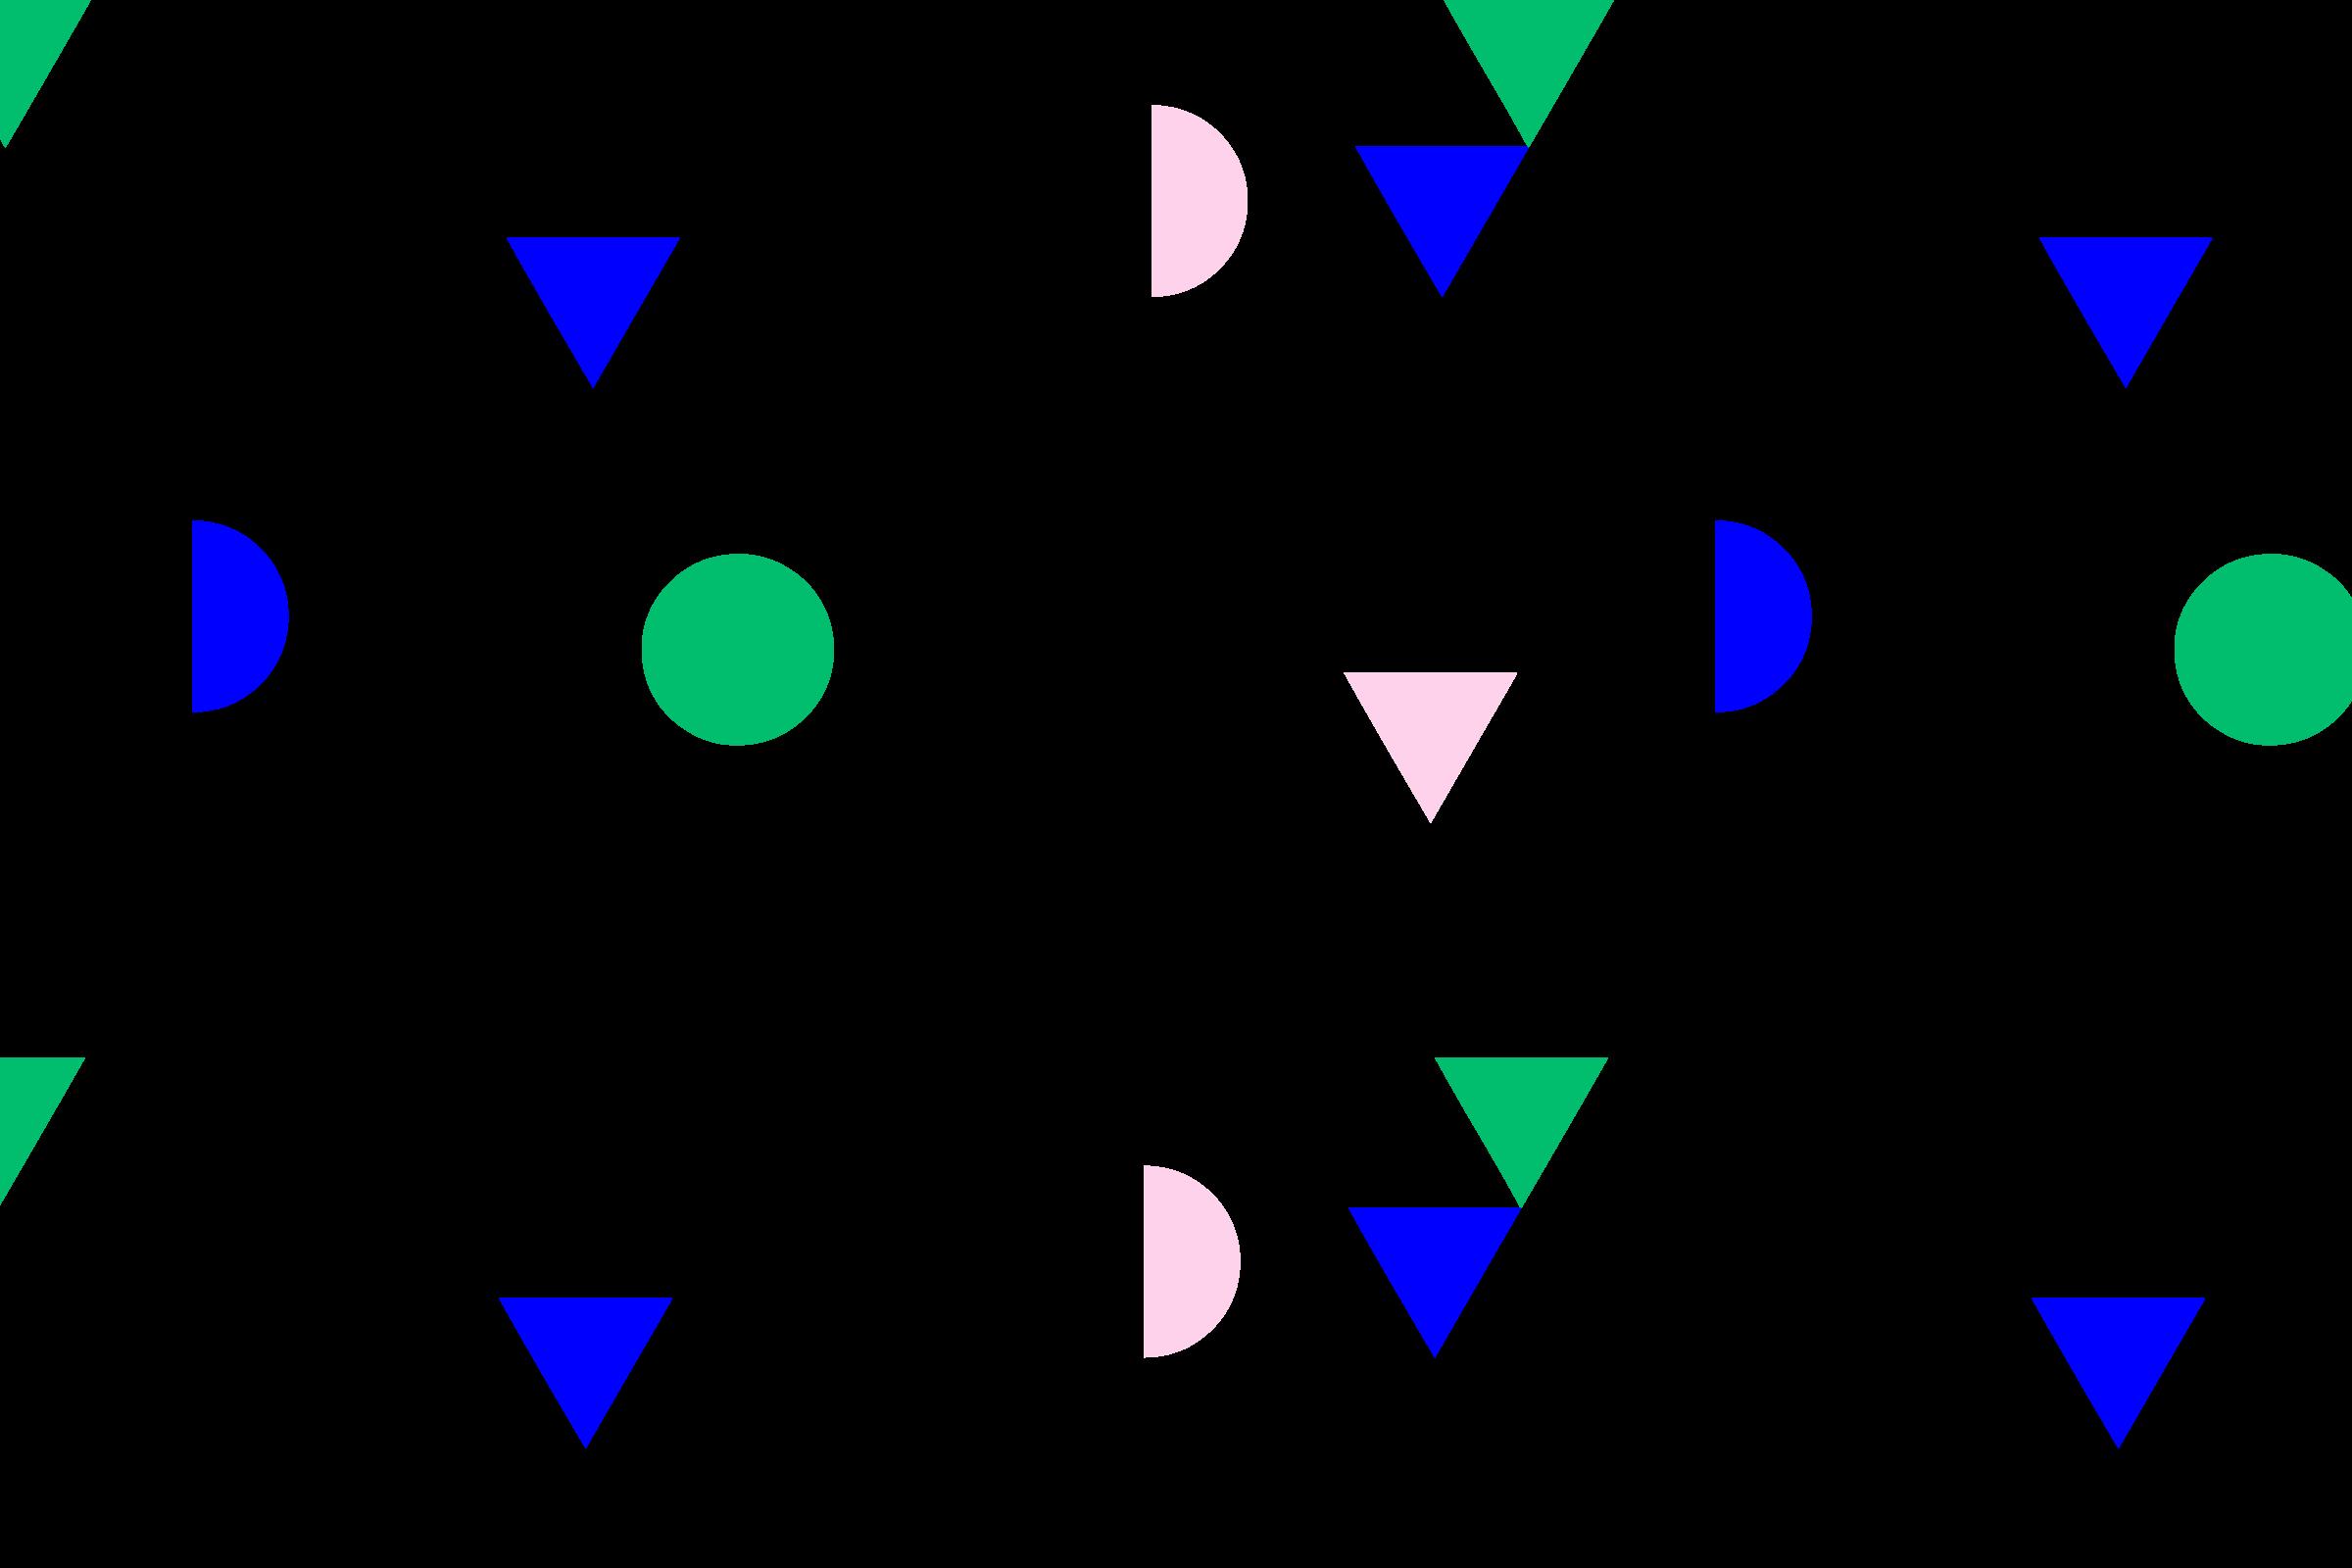 PPP_background_E_variation